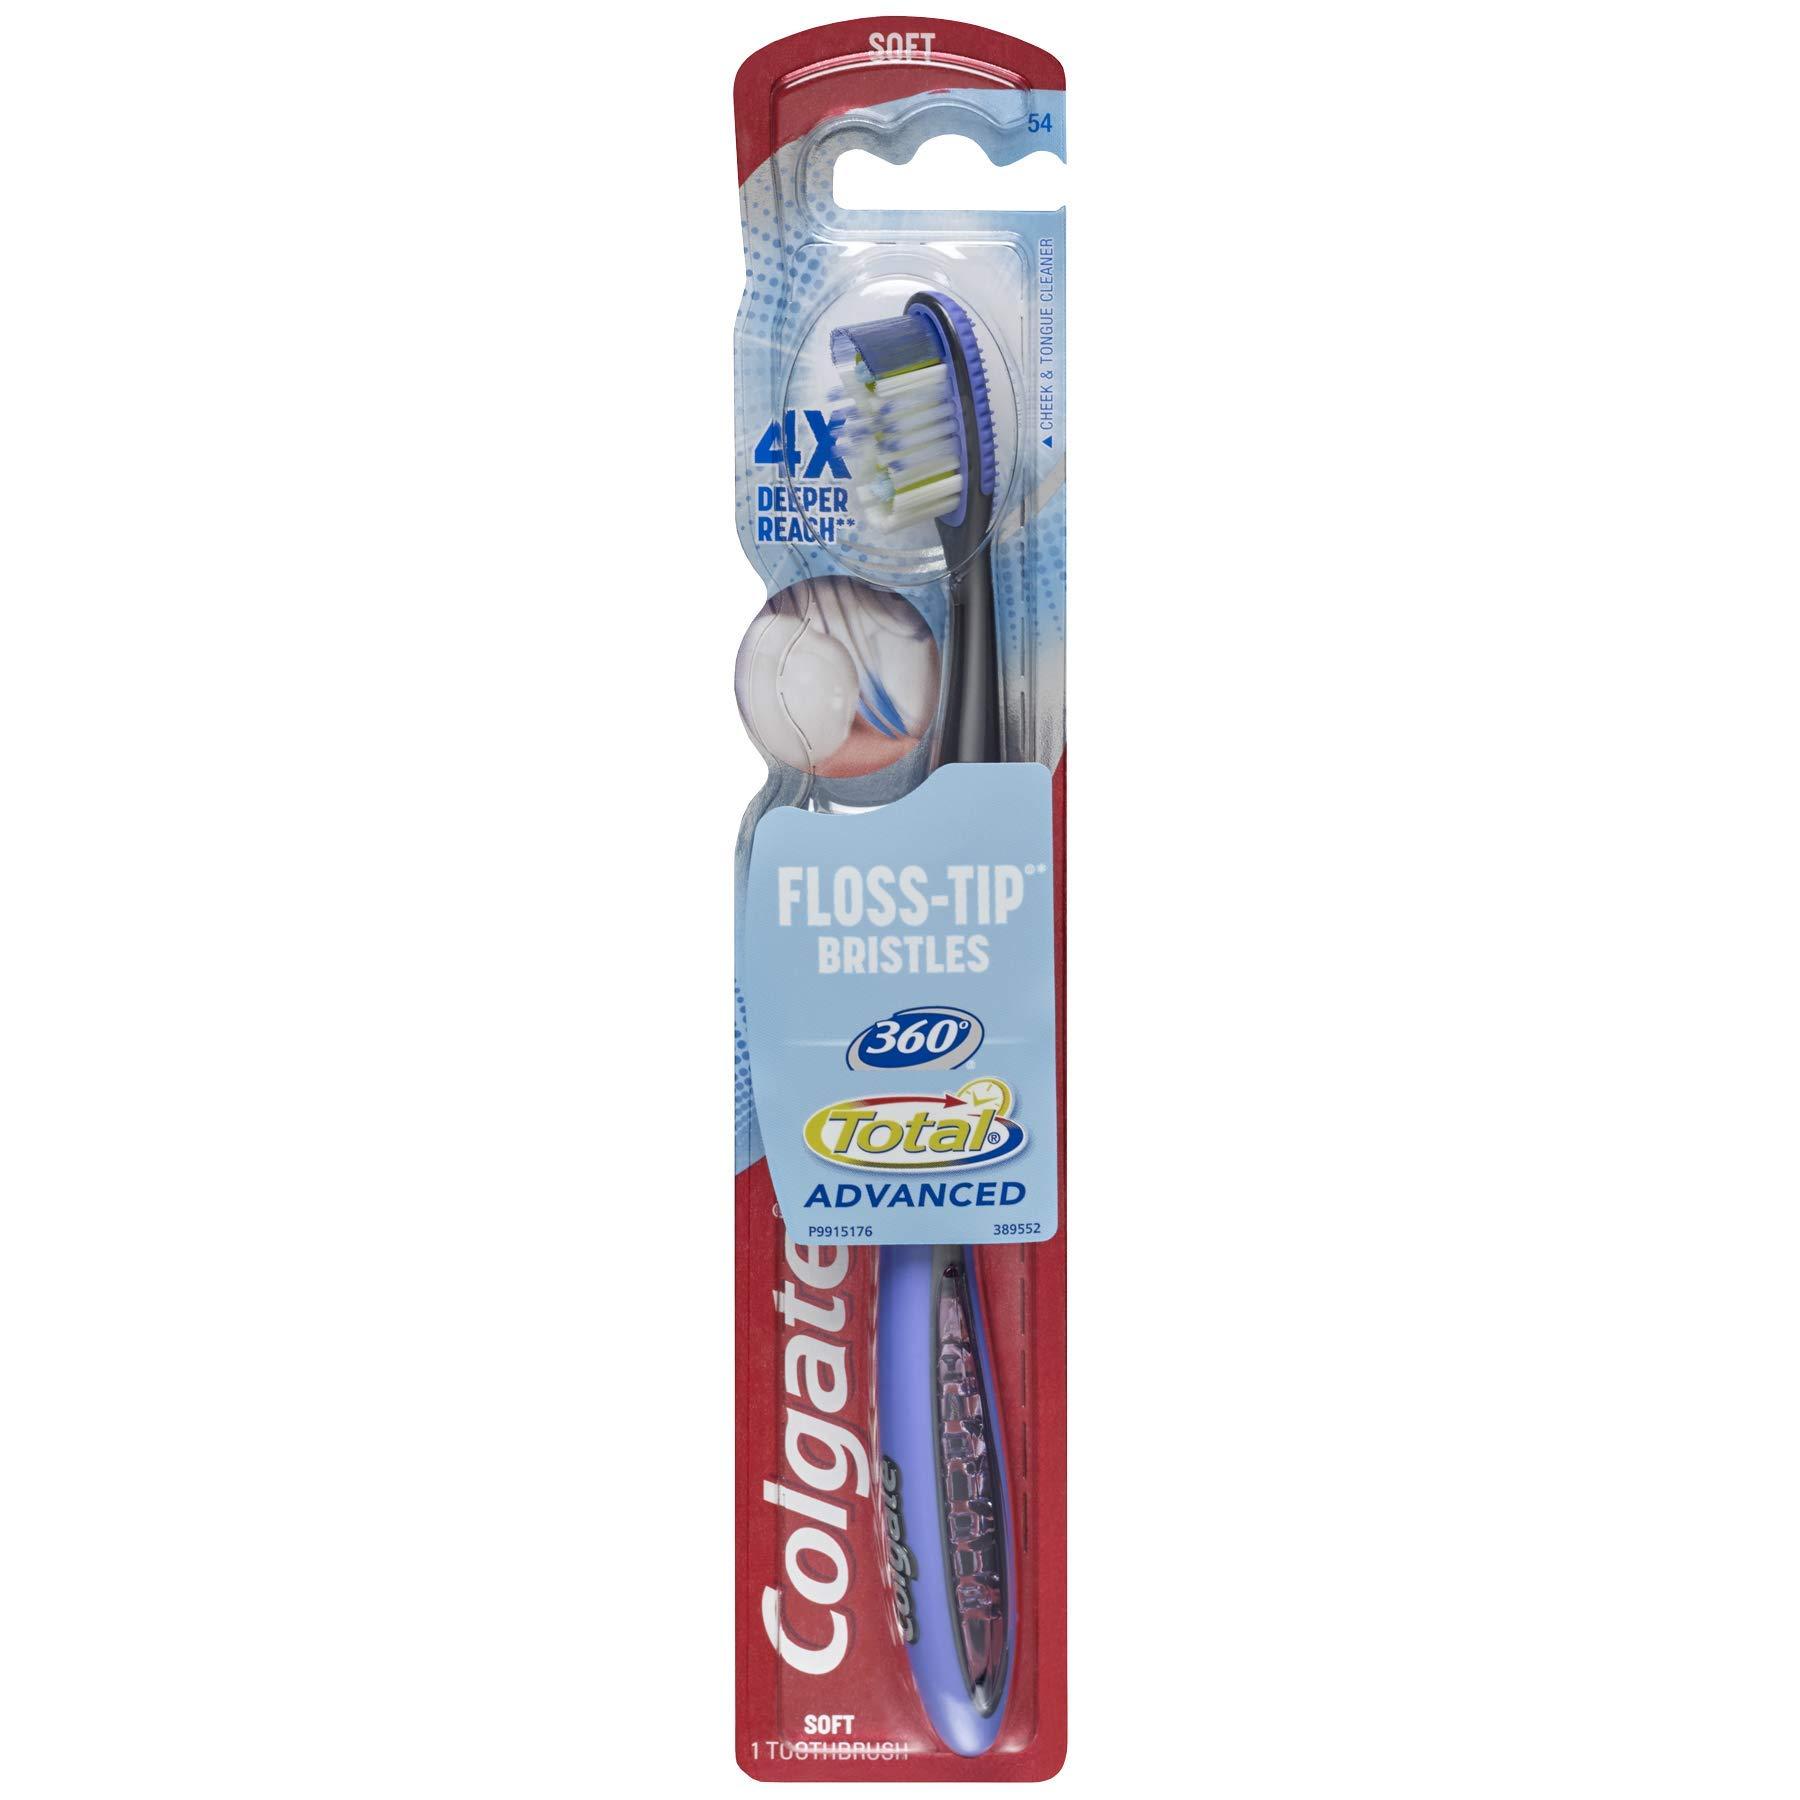 Colgate 360 Total Advanced Floss-Tip Slim Toothbrush, Soft (72 Pack)